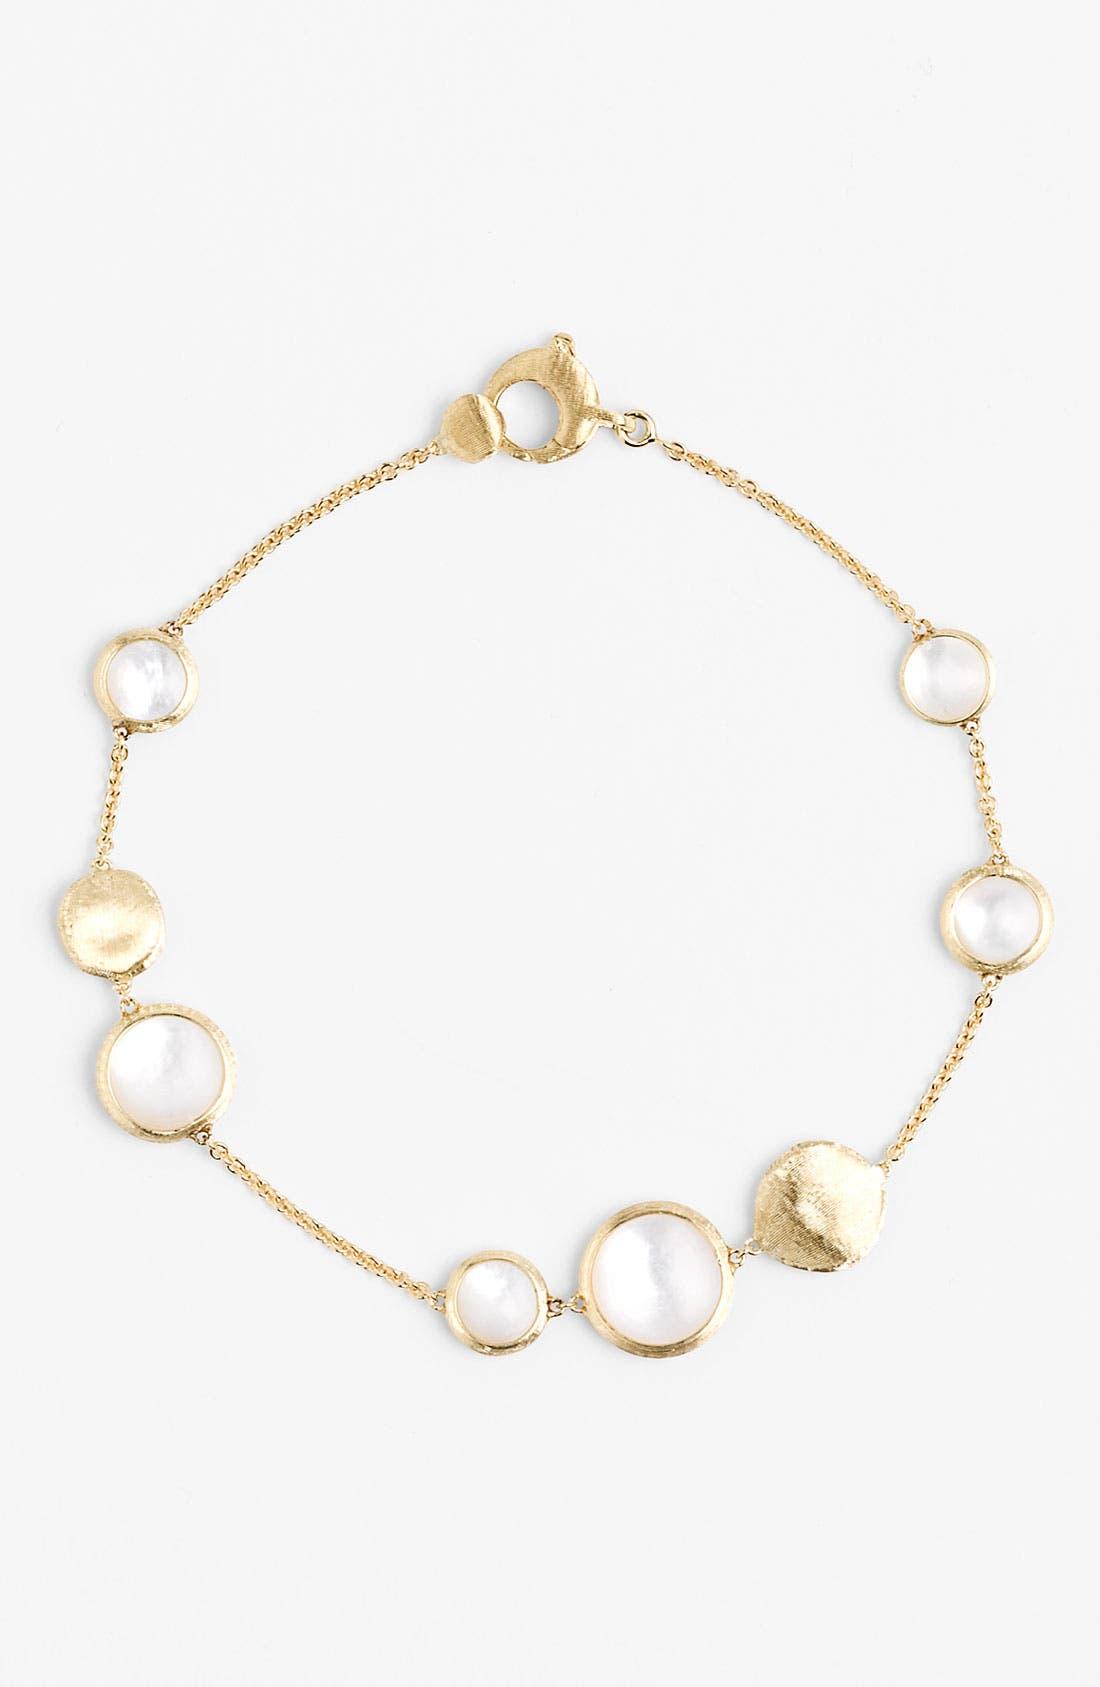 Alternate Image 1 Selected - Marco Bicego 'Jaipur' Station Bracelet